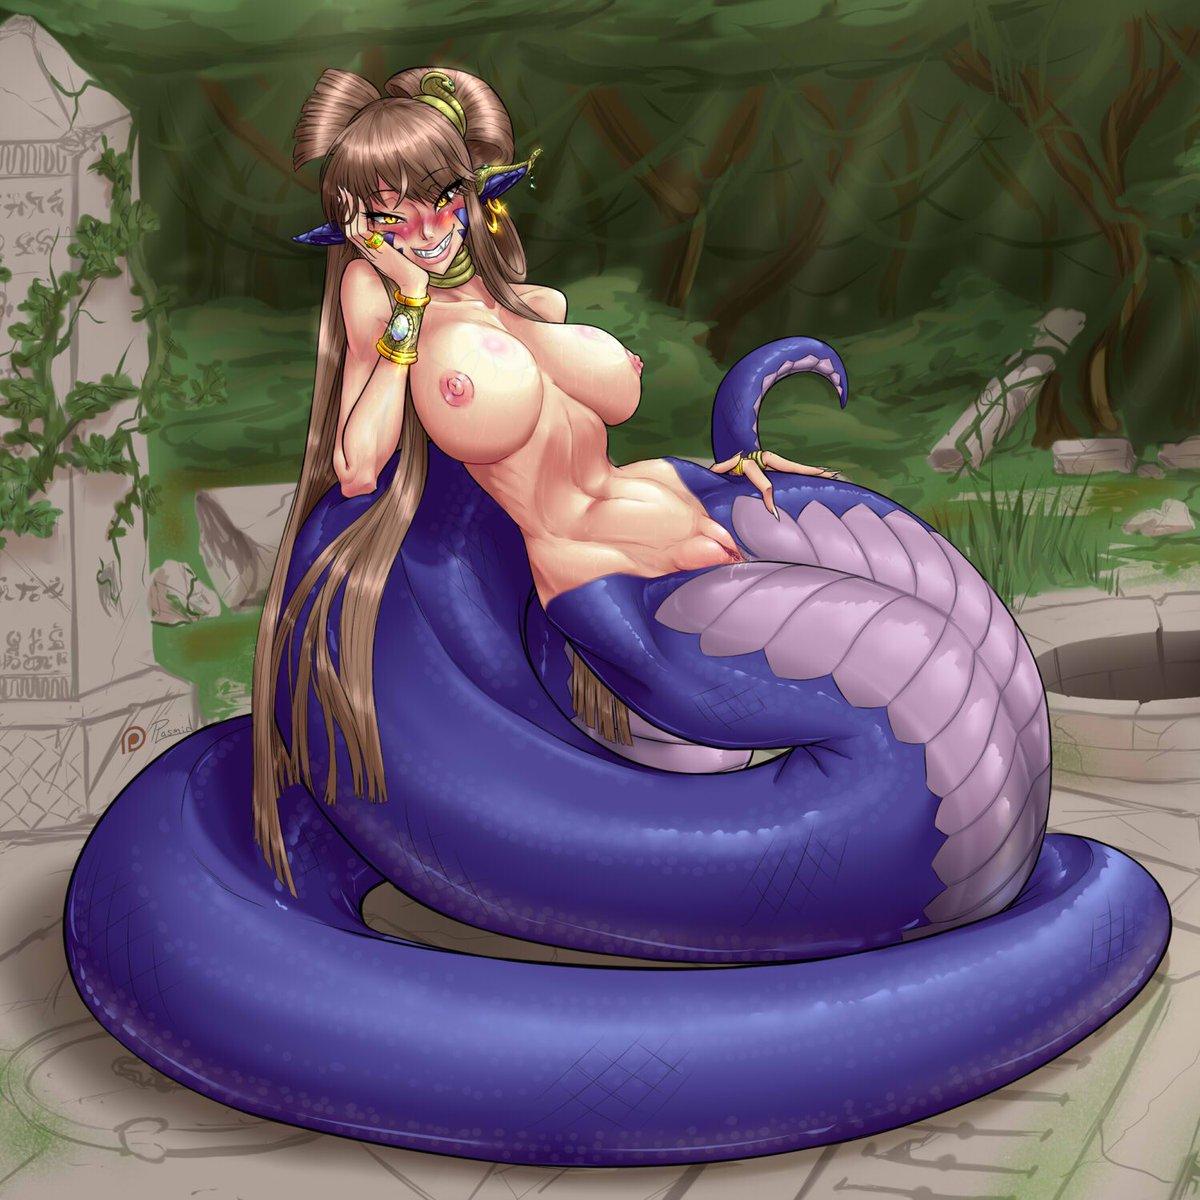 Snake Bdsm Artwork